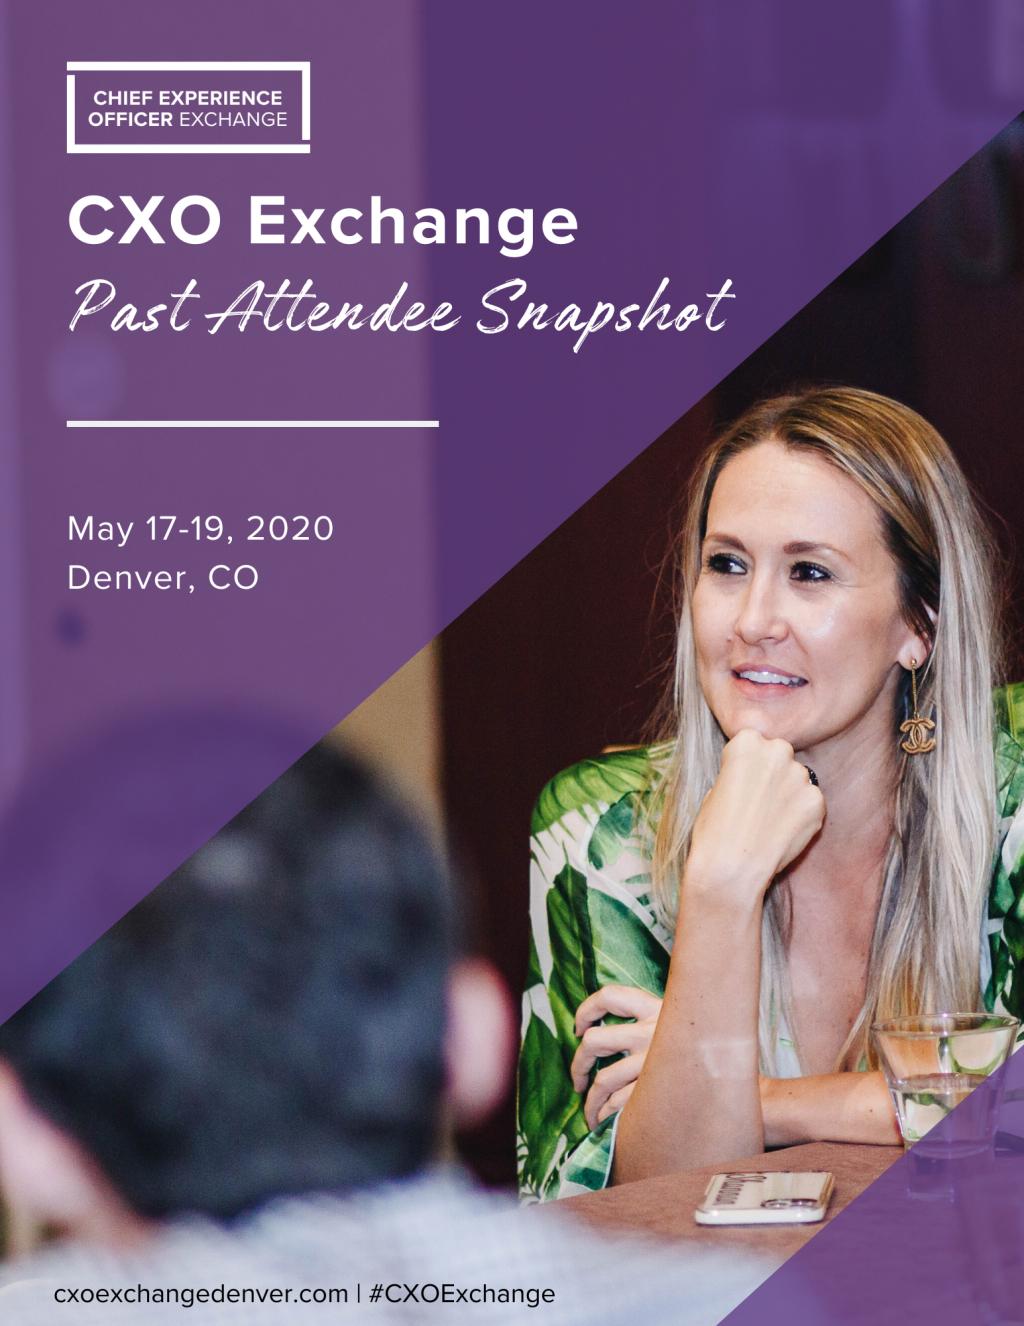 CXO Exchange Denver Past Attendee Snapshot